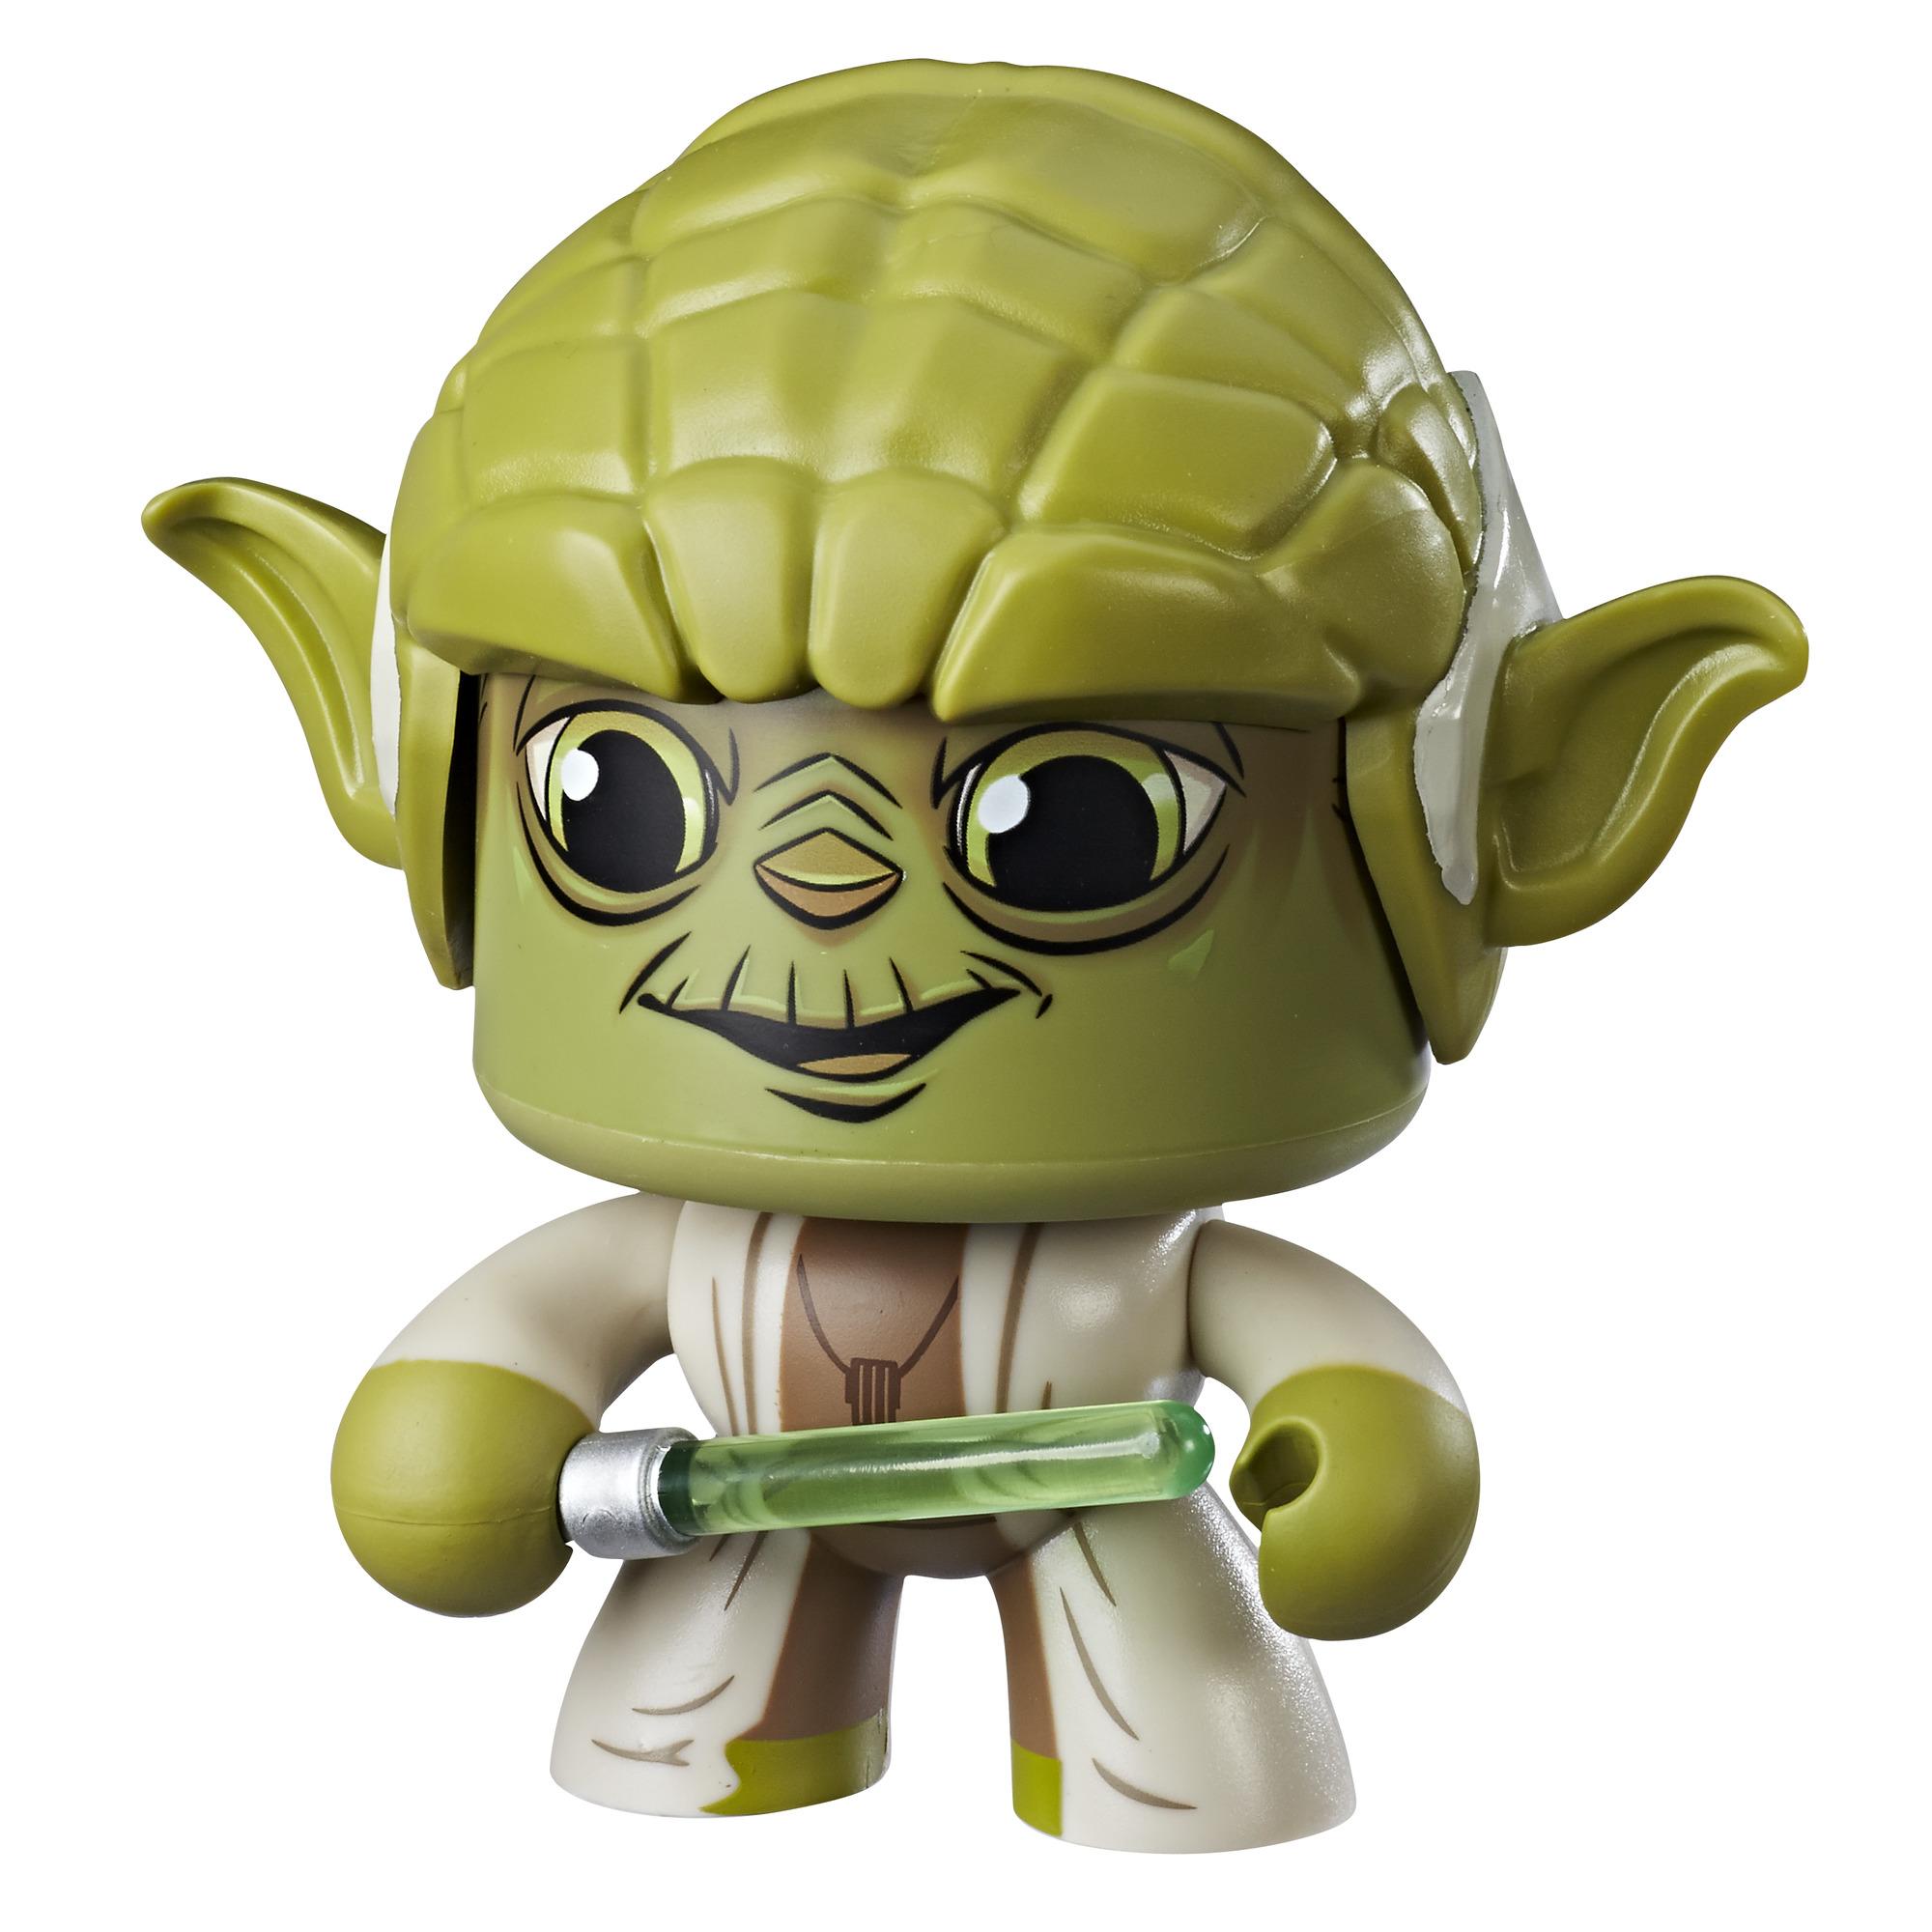 ROTS Master Yoda Mighty Muggs Figure 2